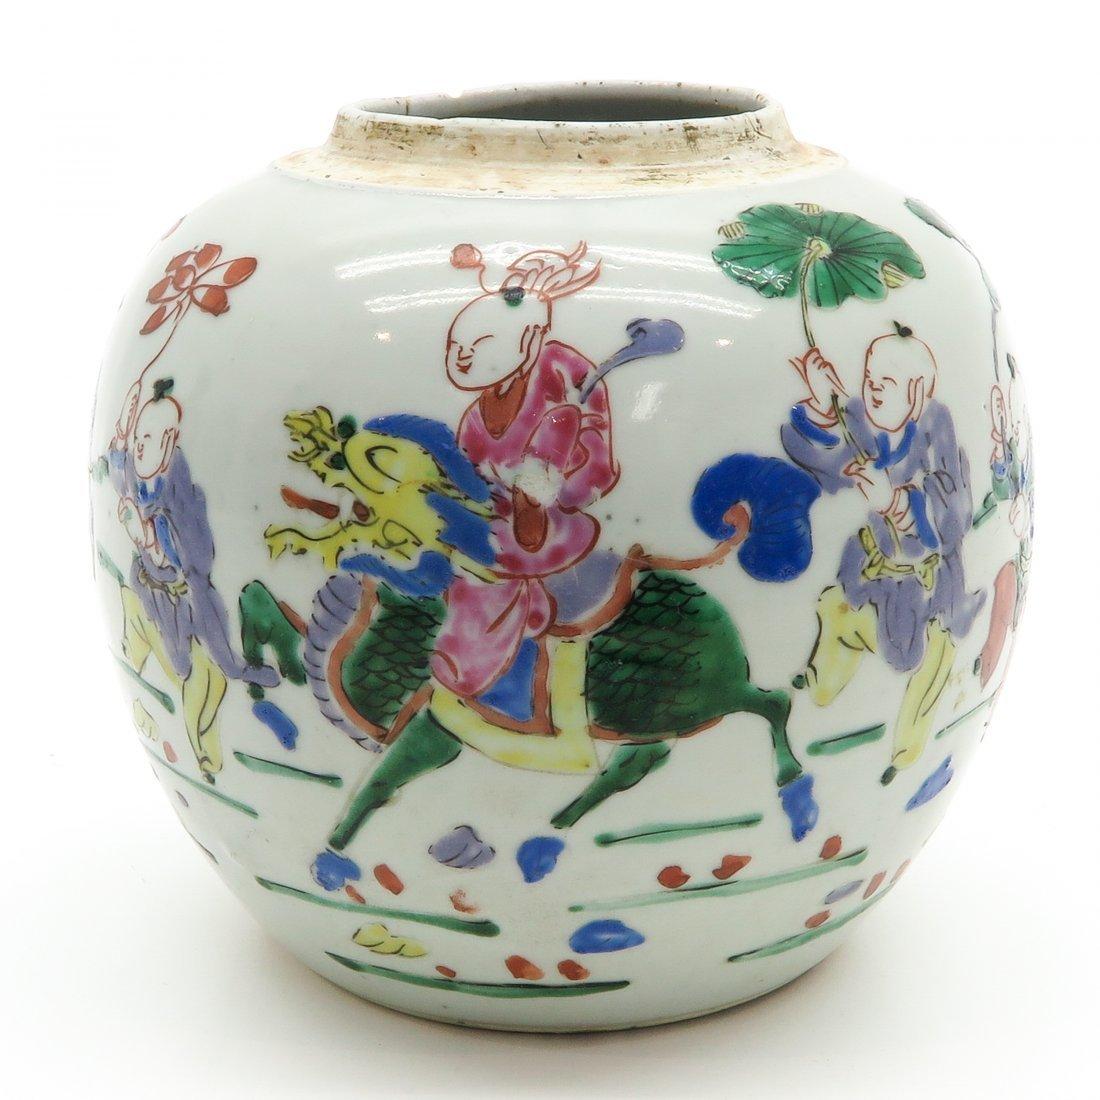 18th Century China Porcelain Ginger Jar